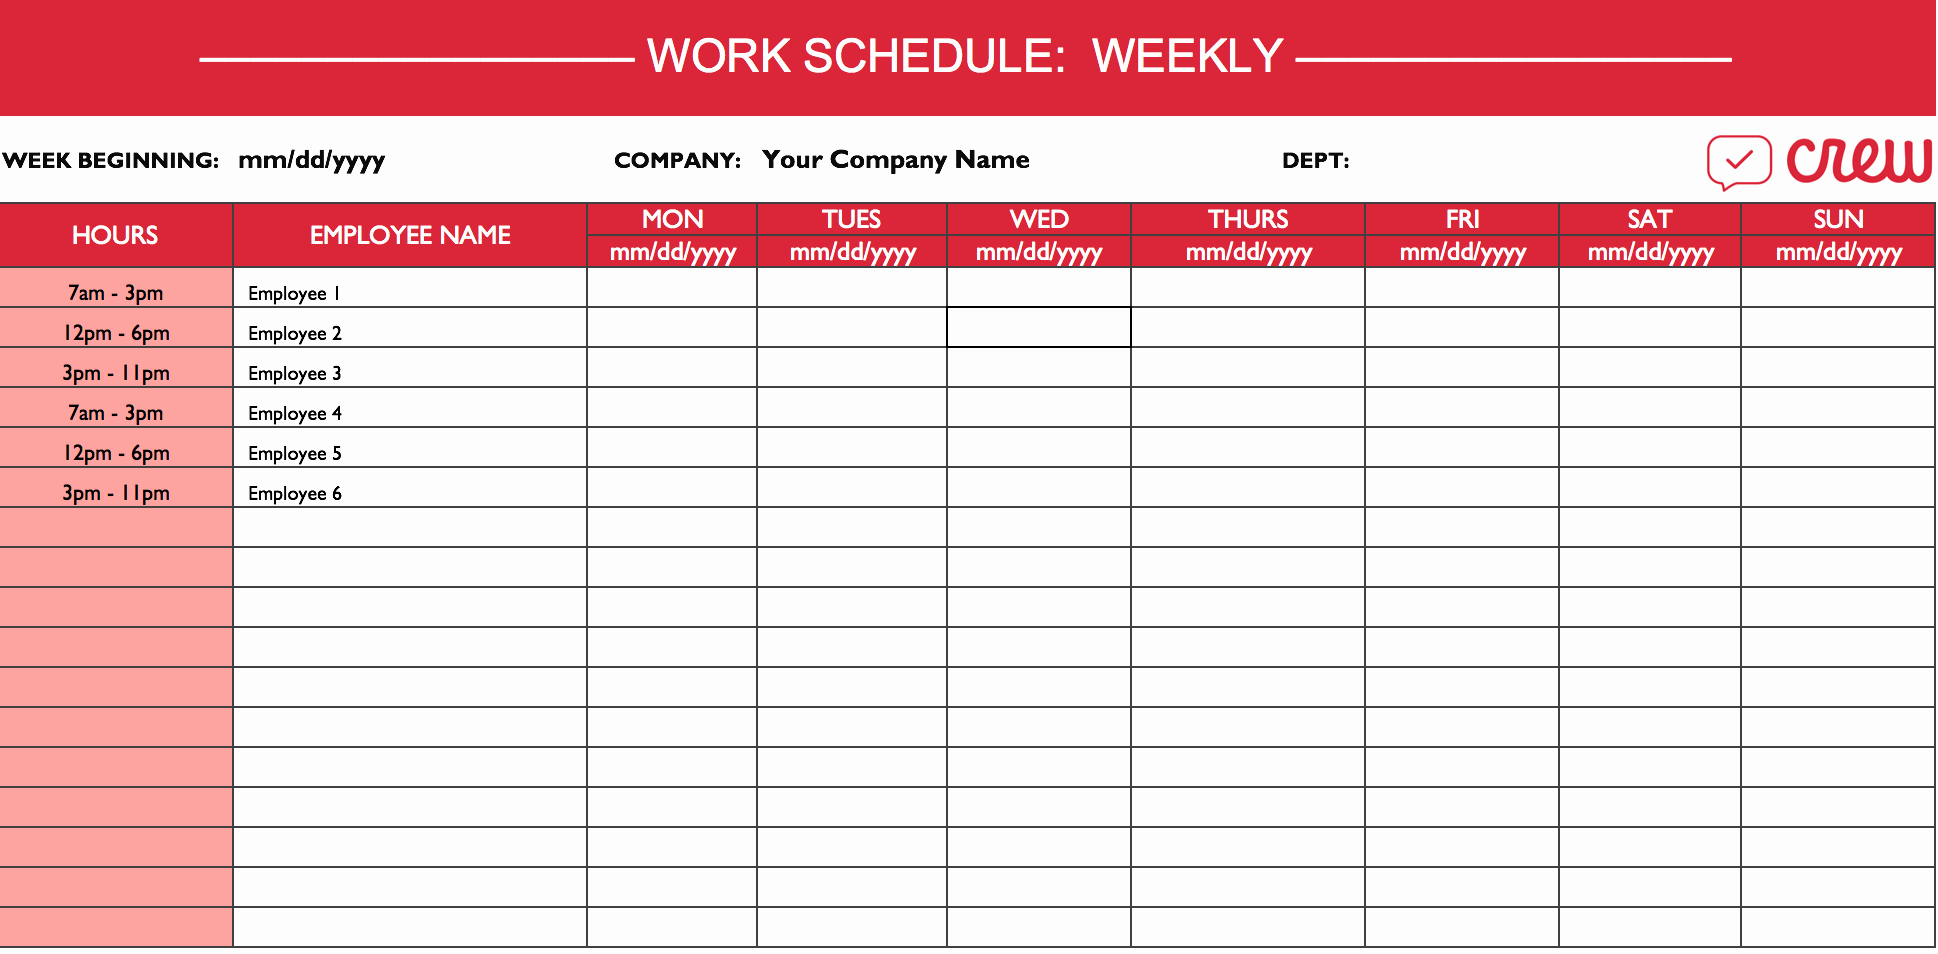 Monthly Shift Schedule Template Elegant Weekly Work Schedule Template I Crew